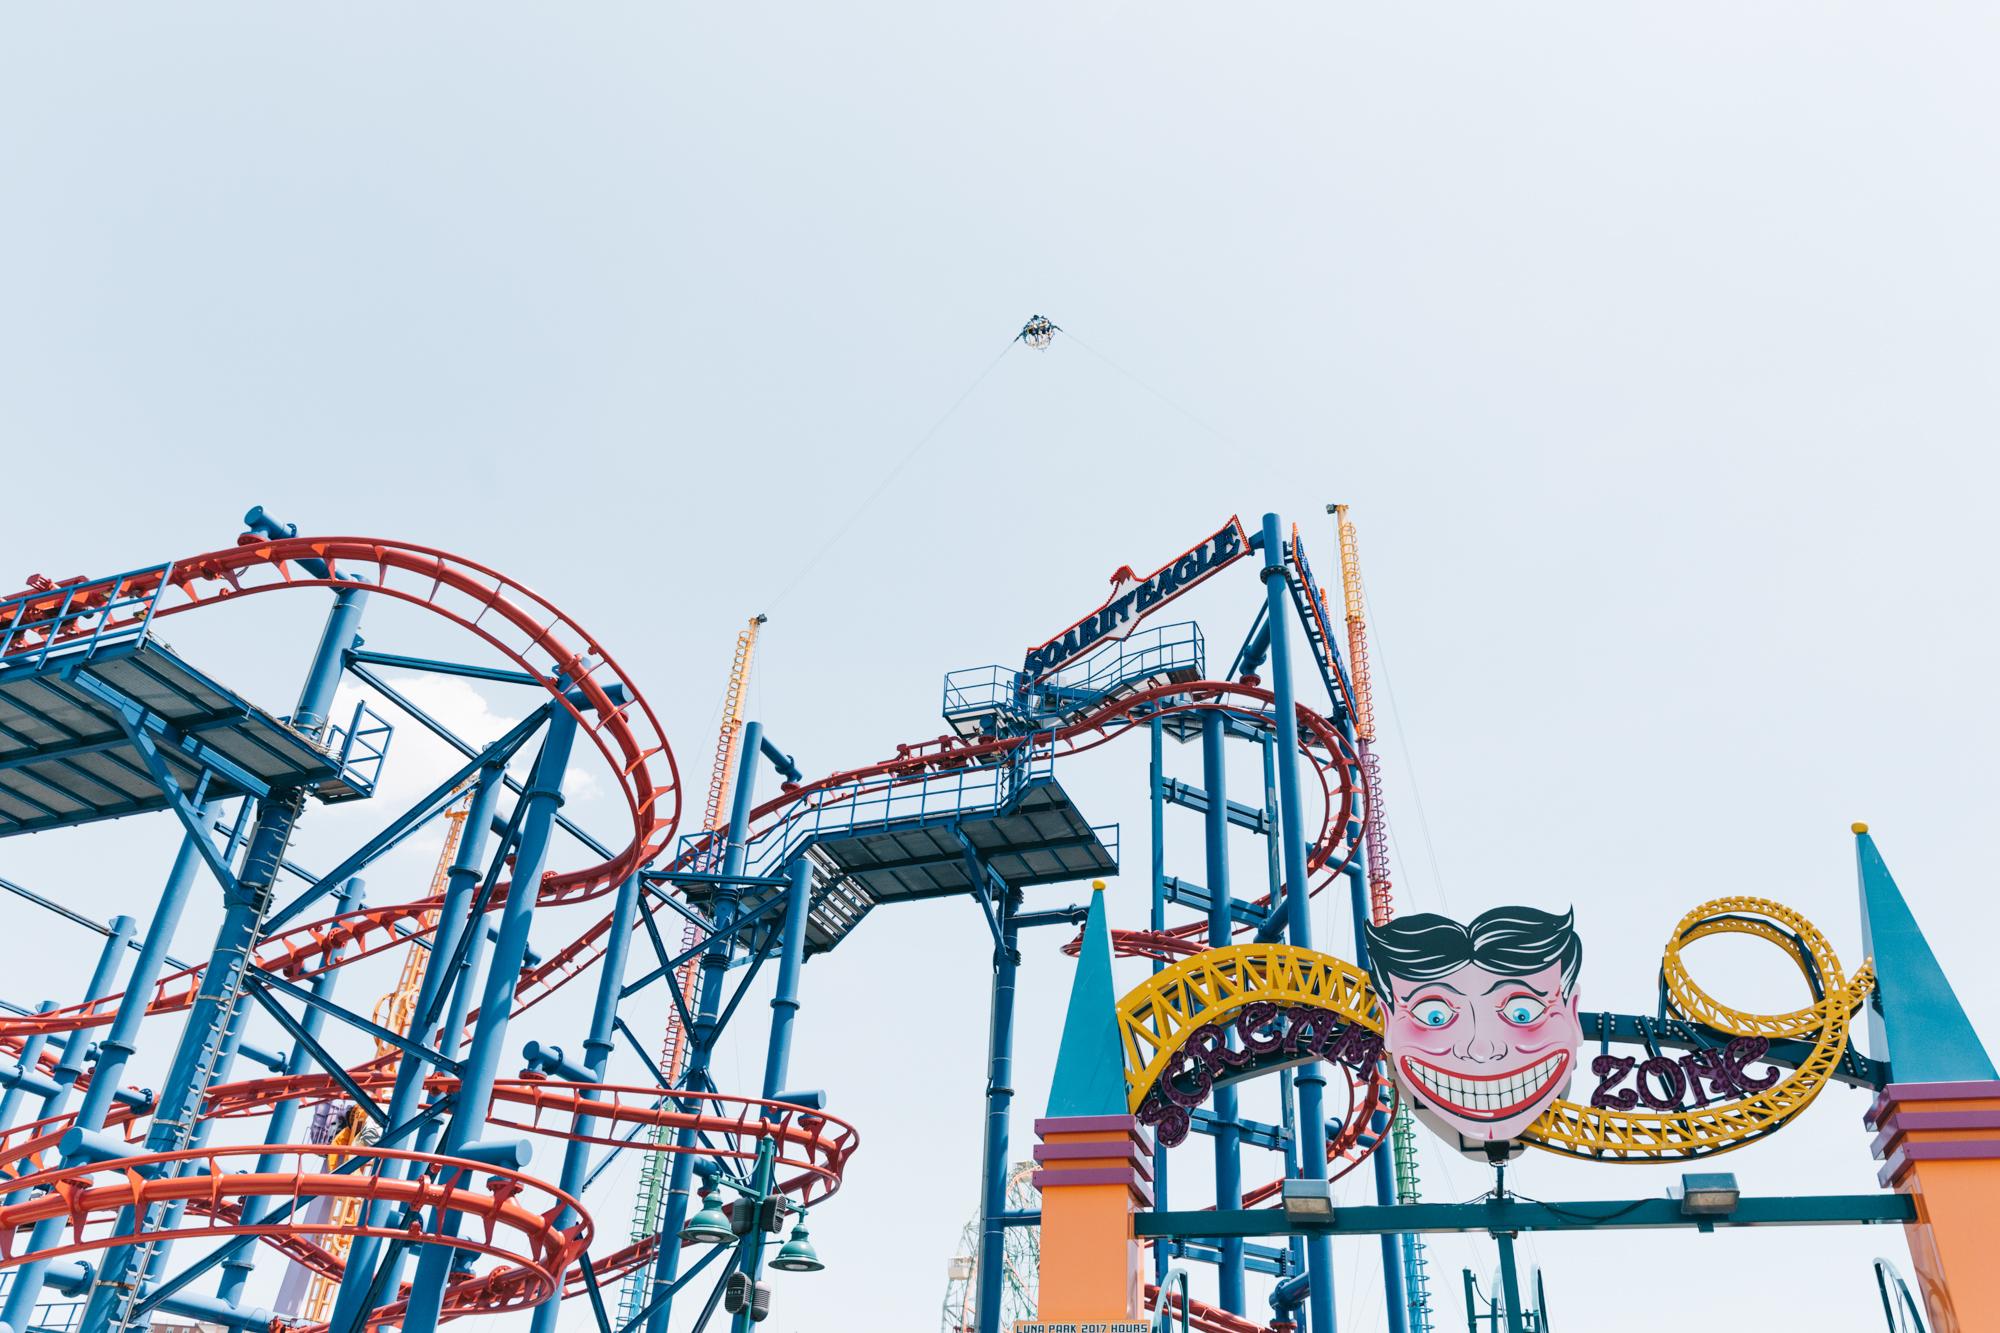 Coney_Island_NYC_4thJuly_DaniellePhotographySA19.jpg